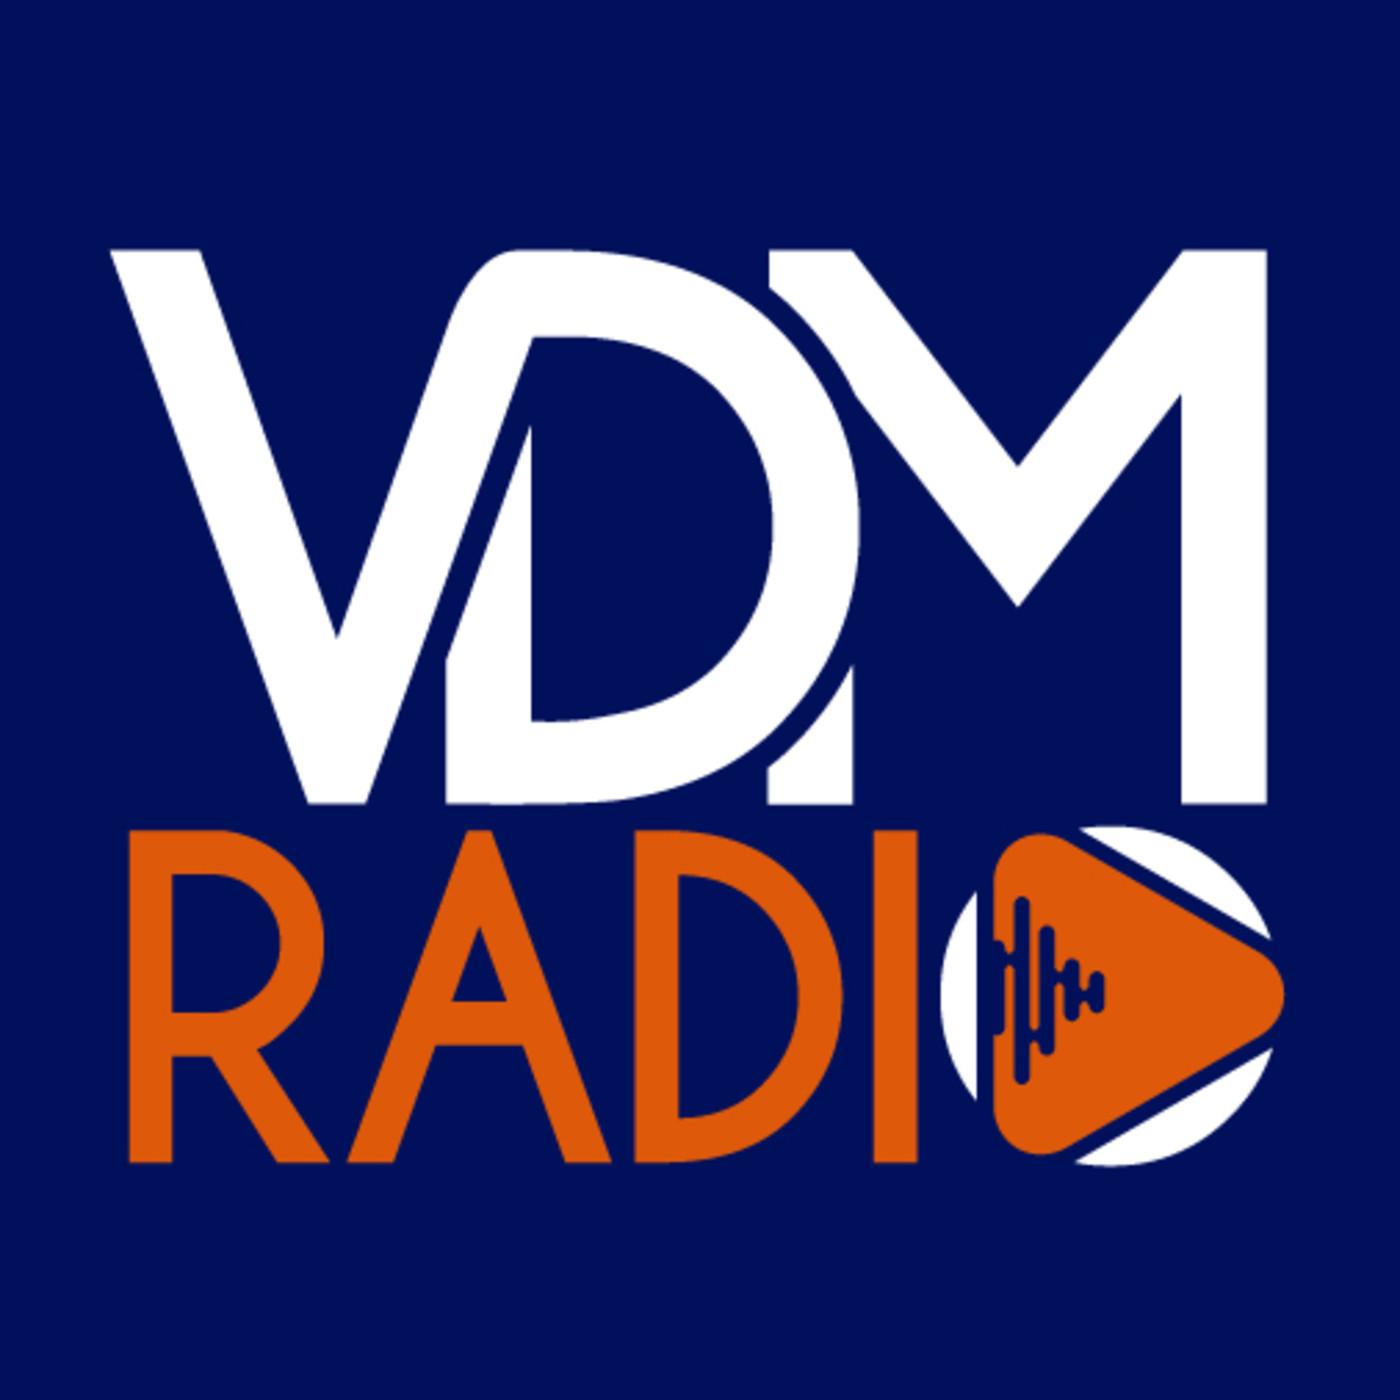 VDM Radio